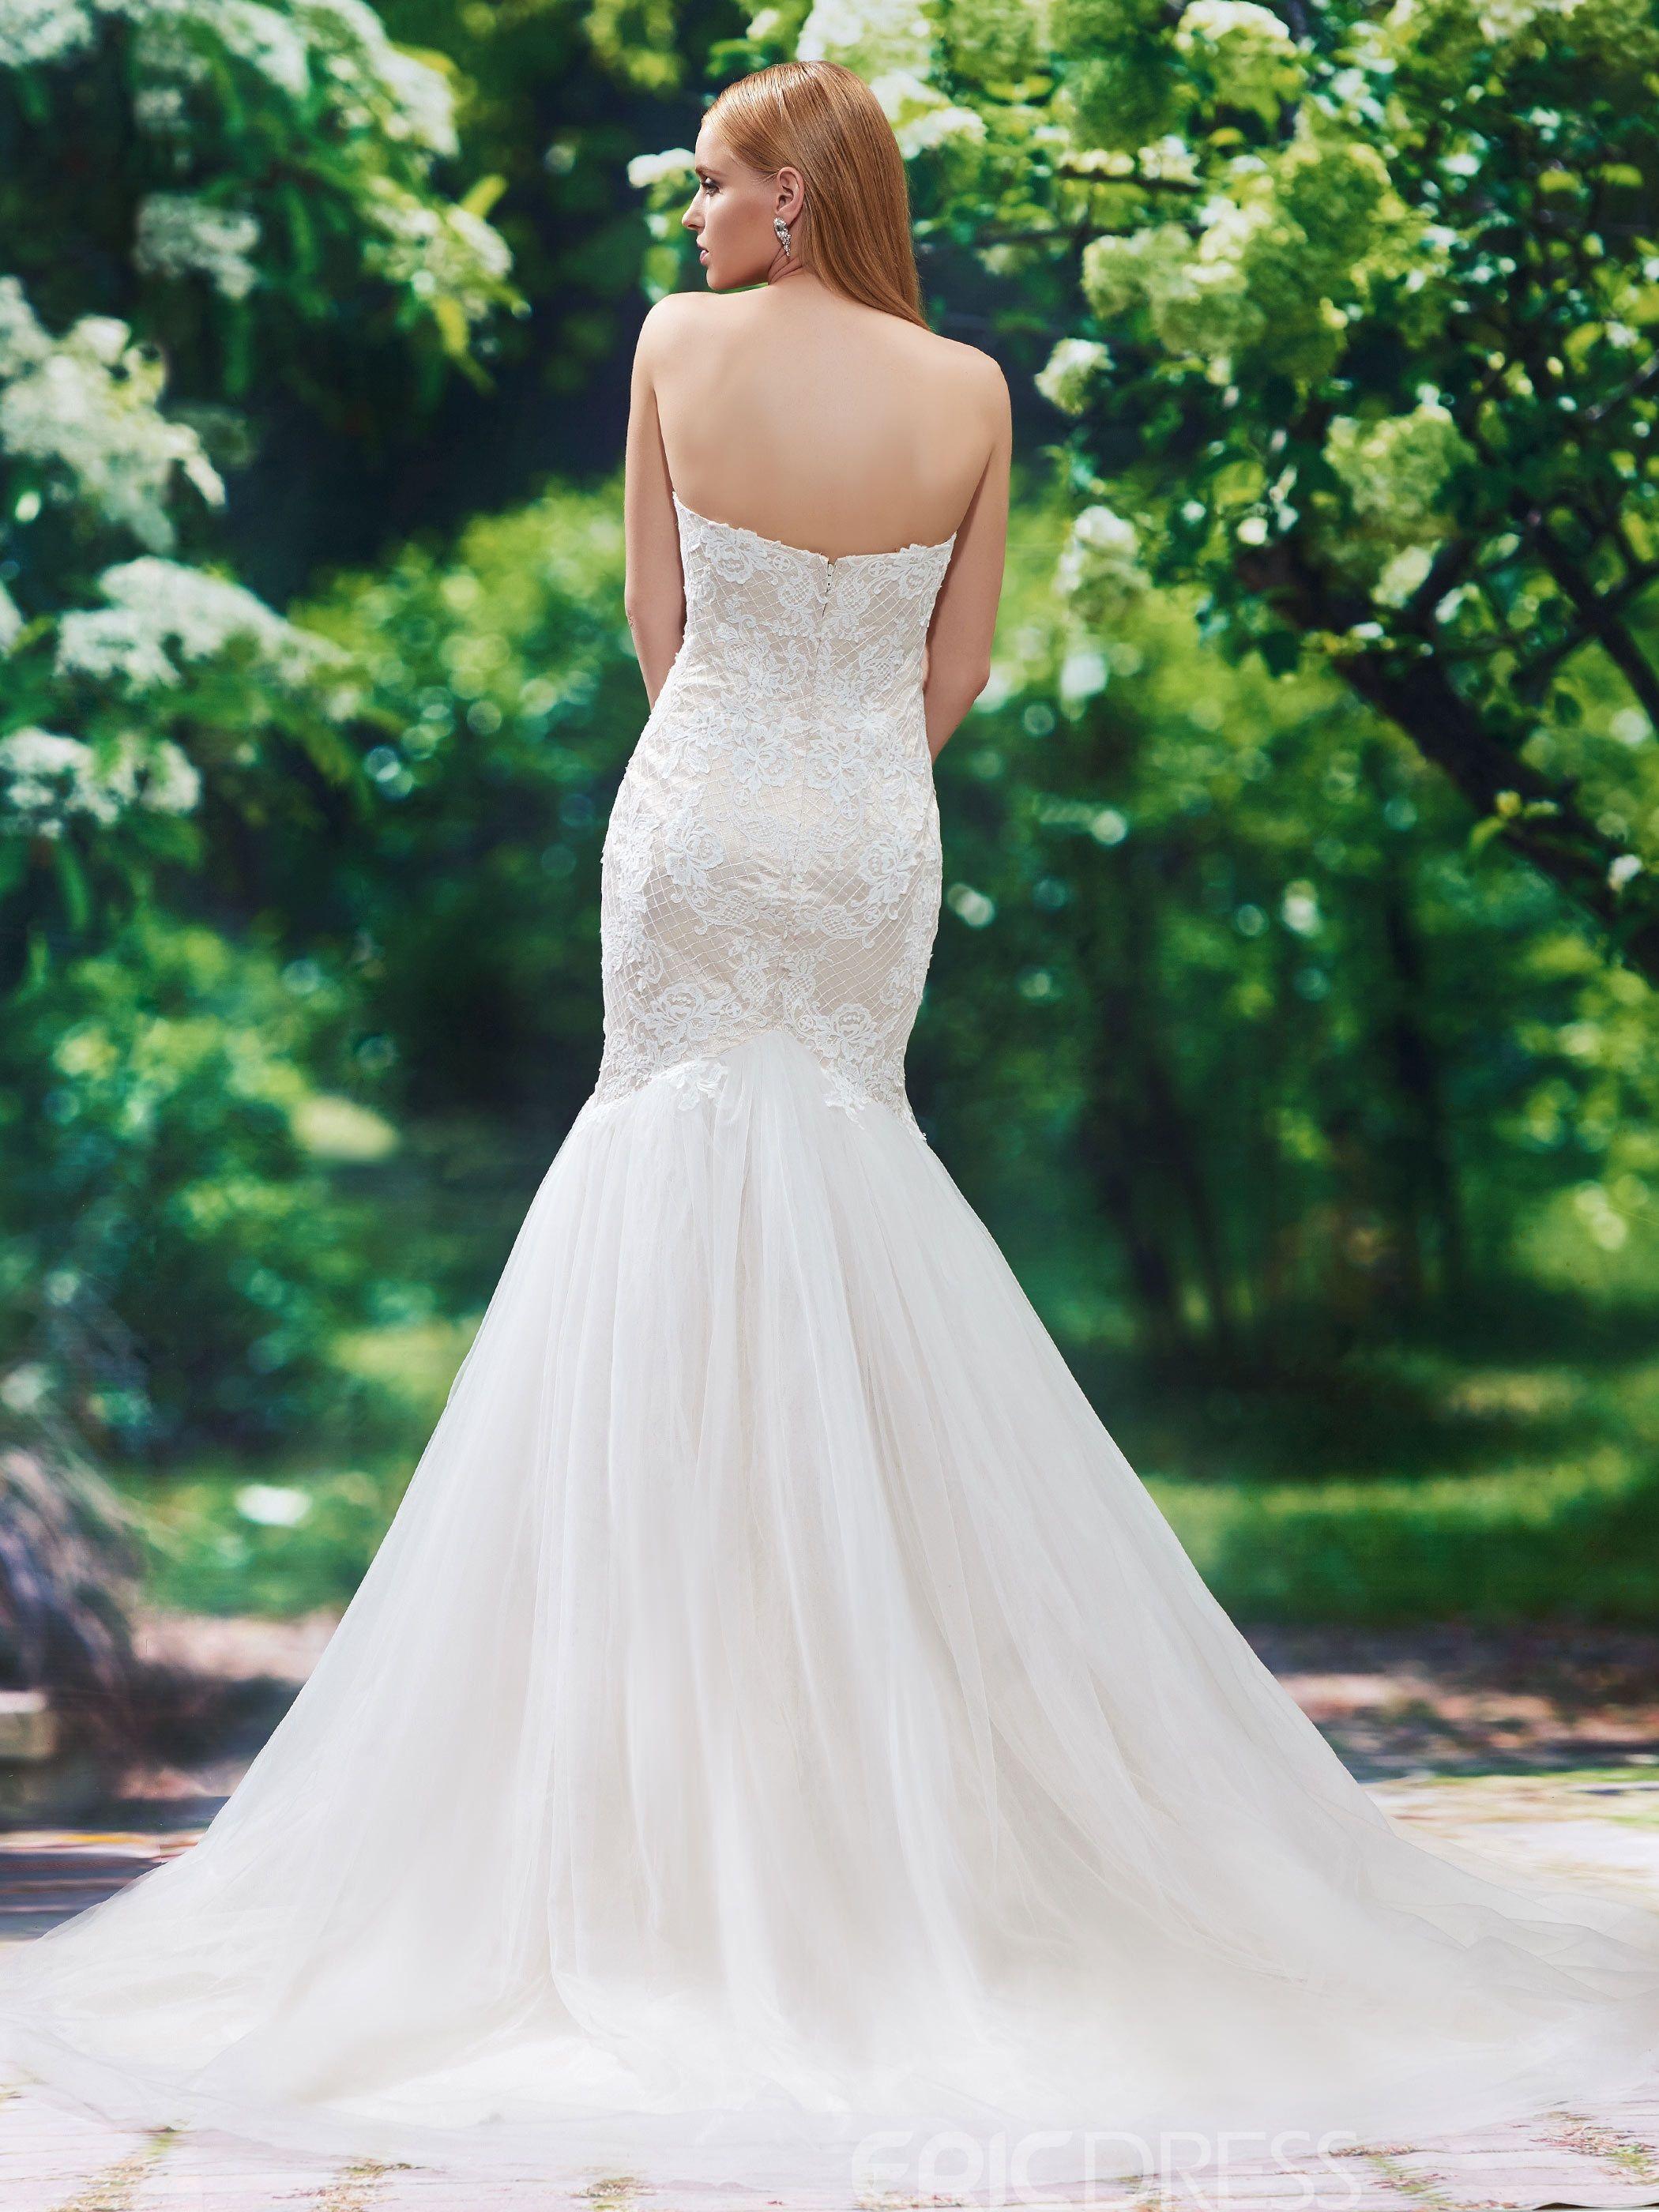 34+ Sweetheart mermaid wedding dresses applique ideas